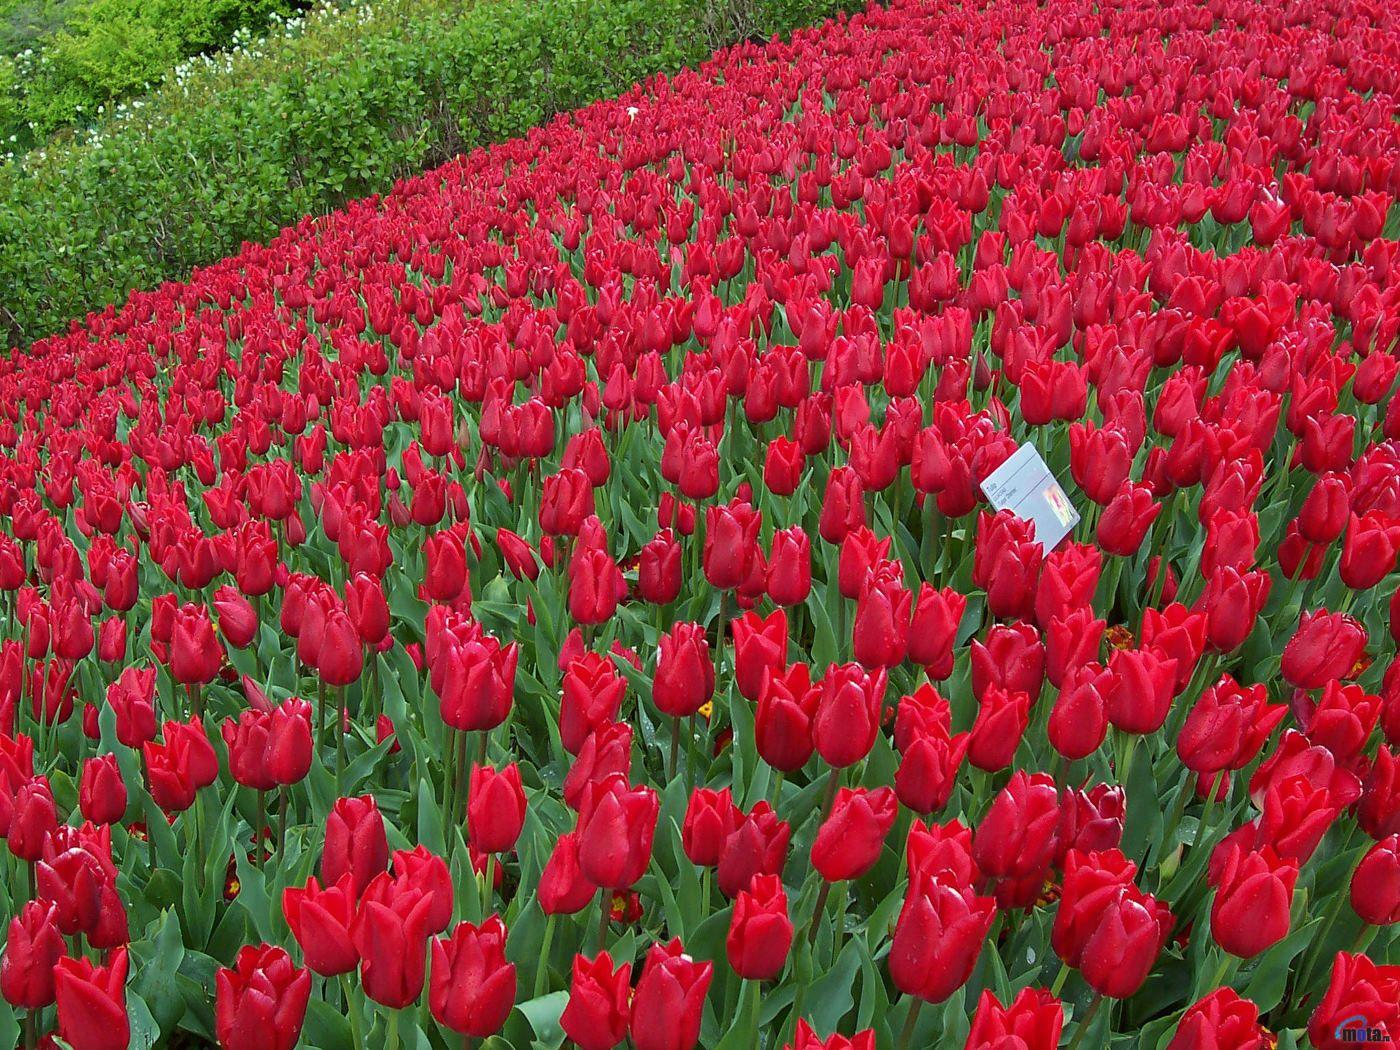 Red rose garden 1 f0gtggus85 14001050 red rose garden 1 f0gtggus85 14001050 izmirmasajfo